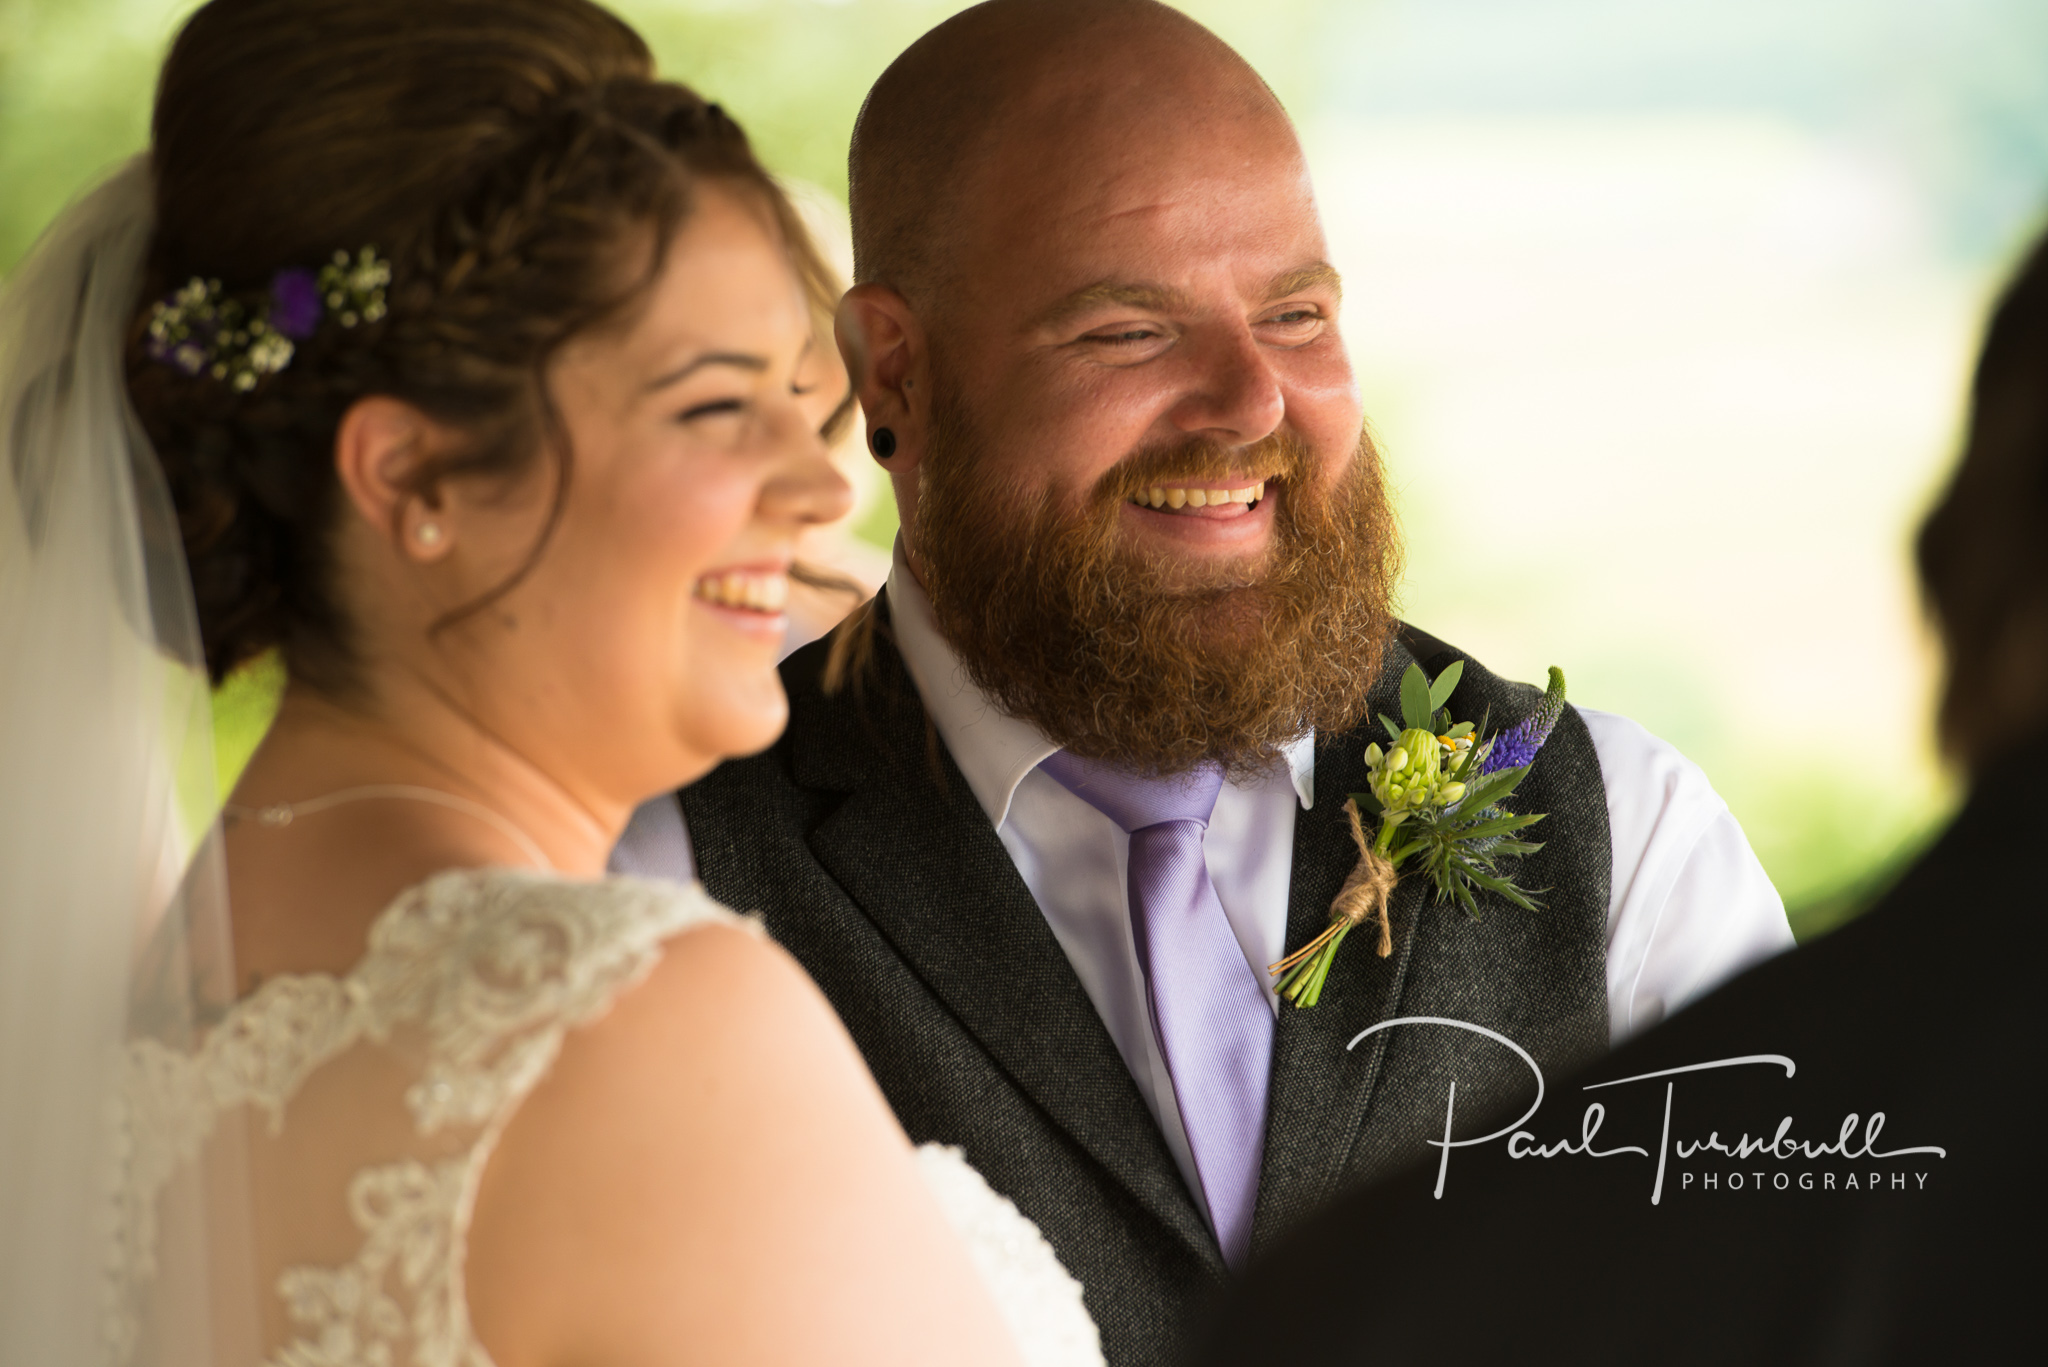 wedding-photographer-hilltop-farm-ilton-yorkshire-017.jpg